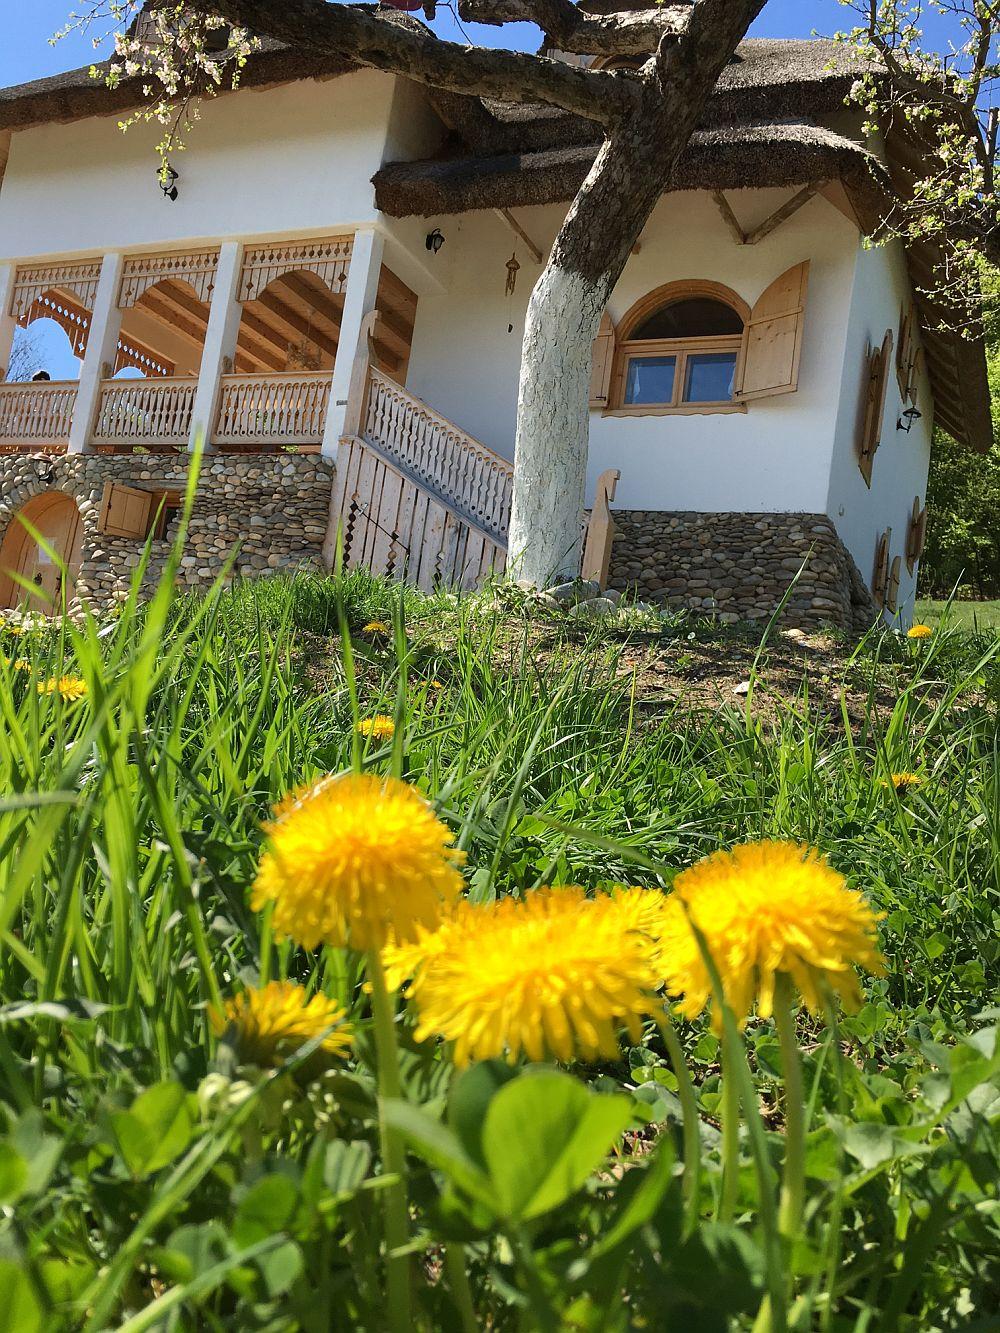 adelaparvu.com despre casa traditionala romaneasca reinterpretata, Foto Dragos Boldea (84)